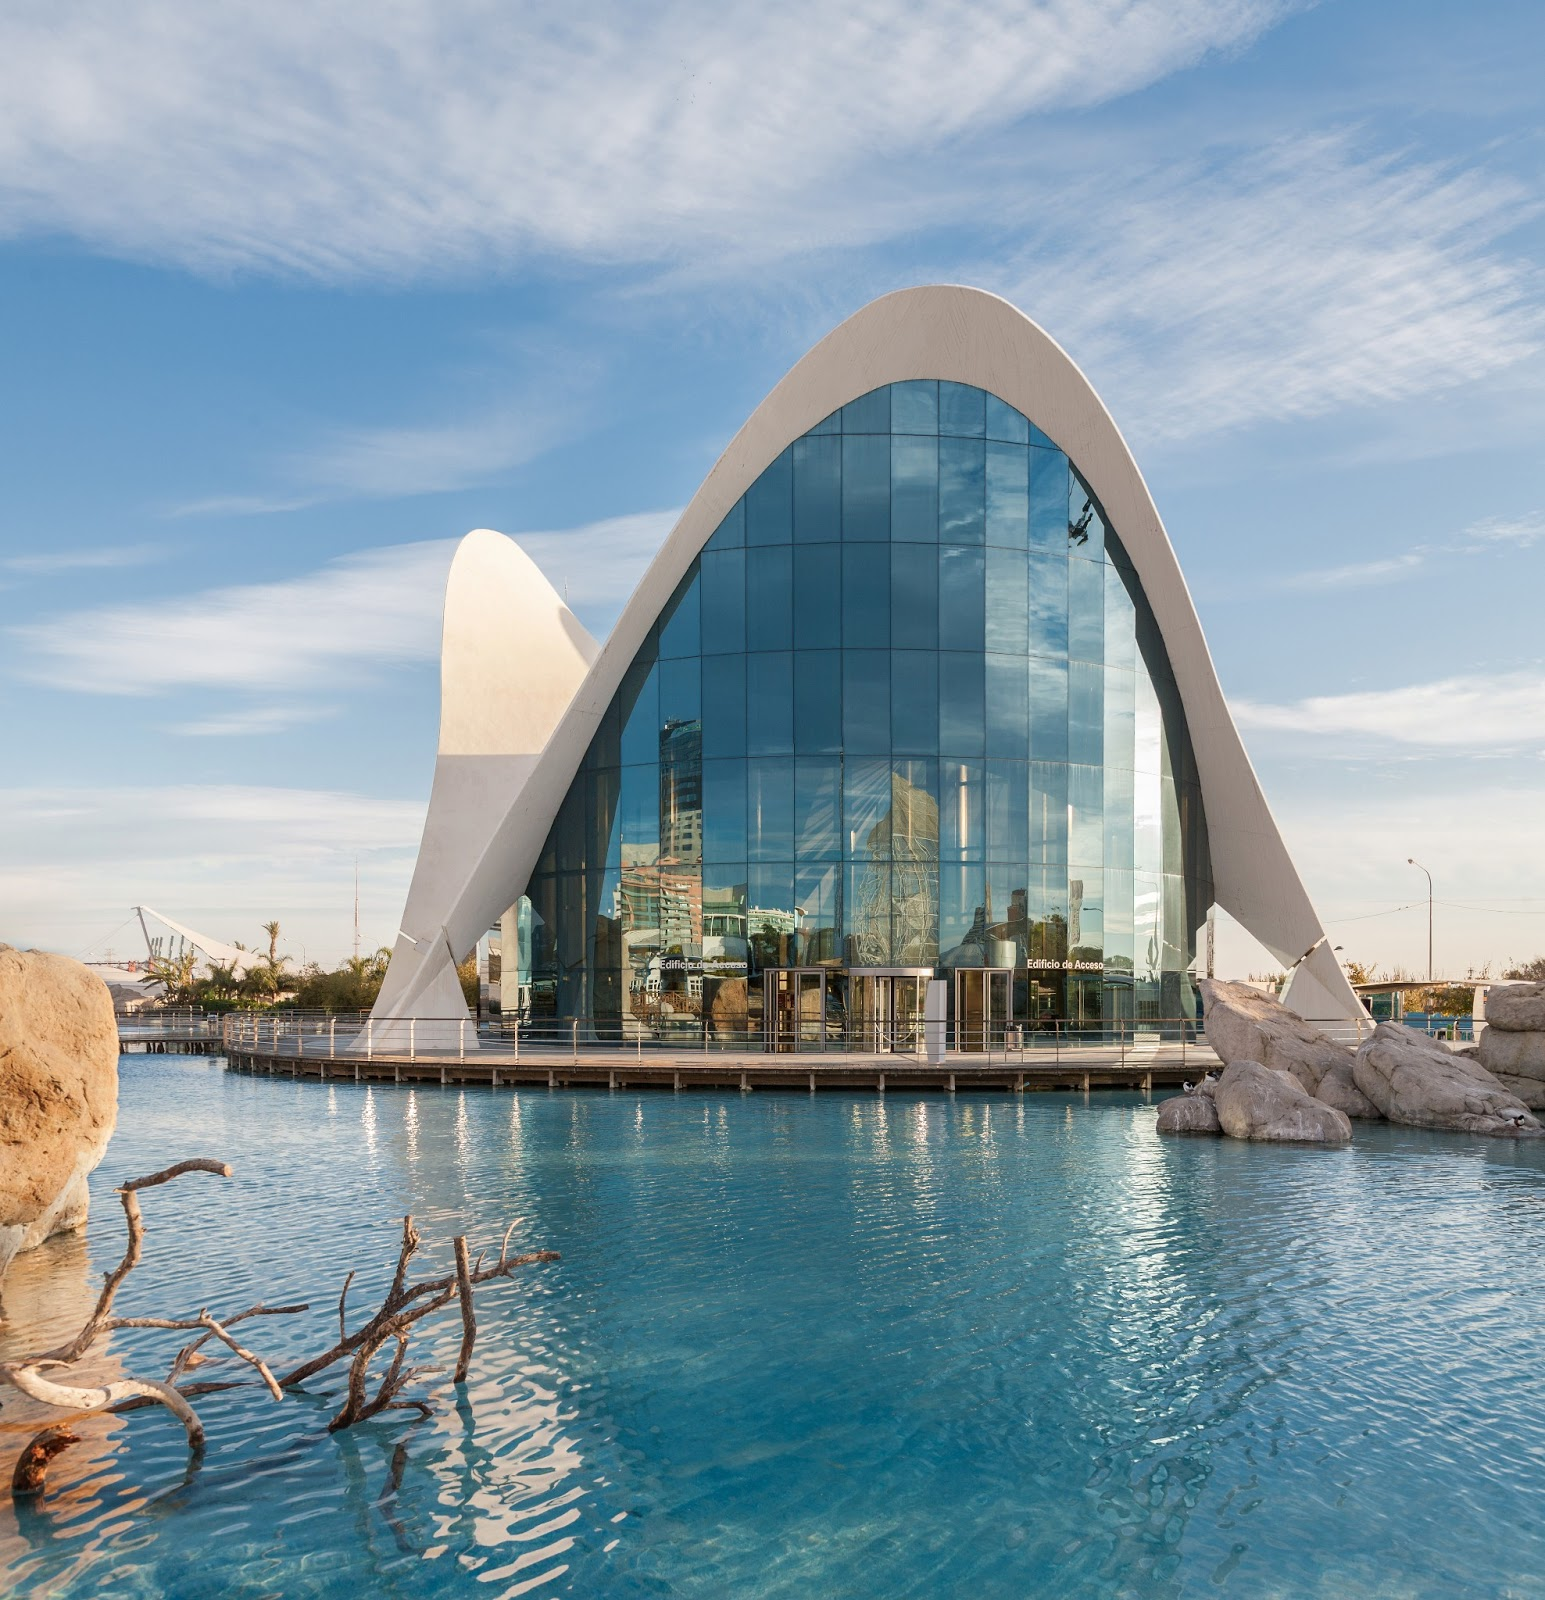 #285063 Inova Vidros: Vidro & Arquitetura Obras Incríveis 1580 Vidros Janelas Fortaleza